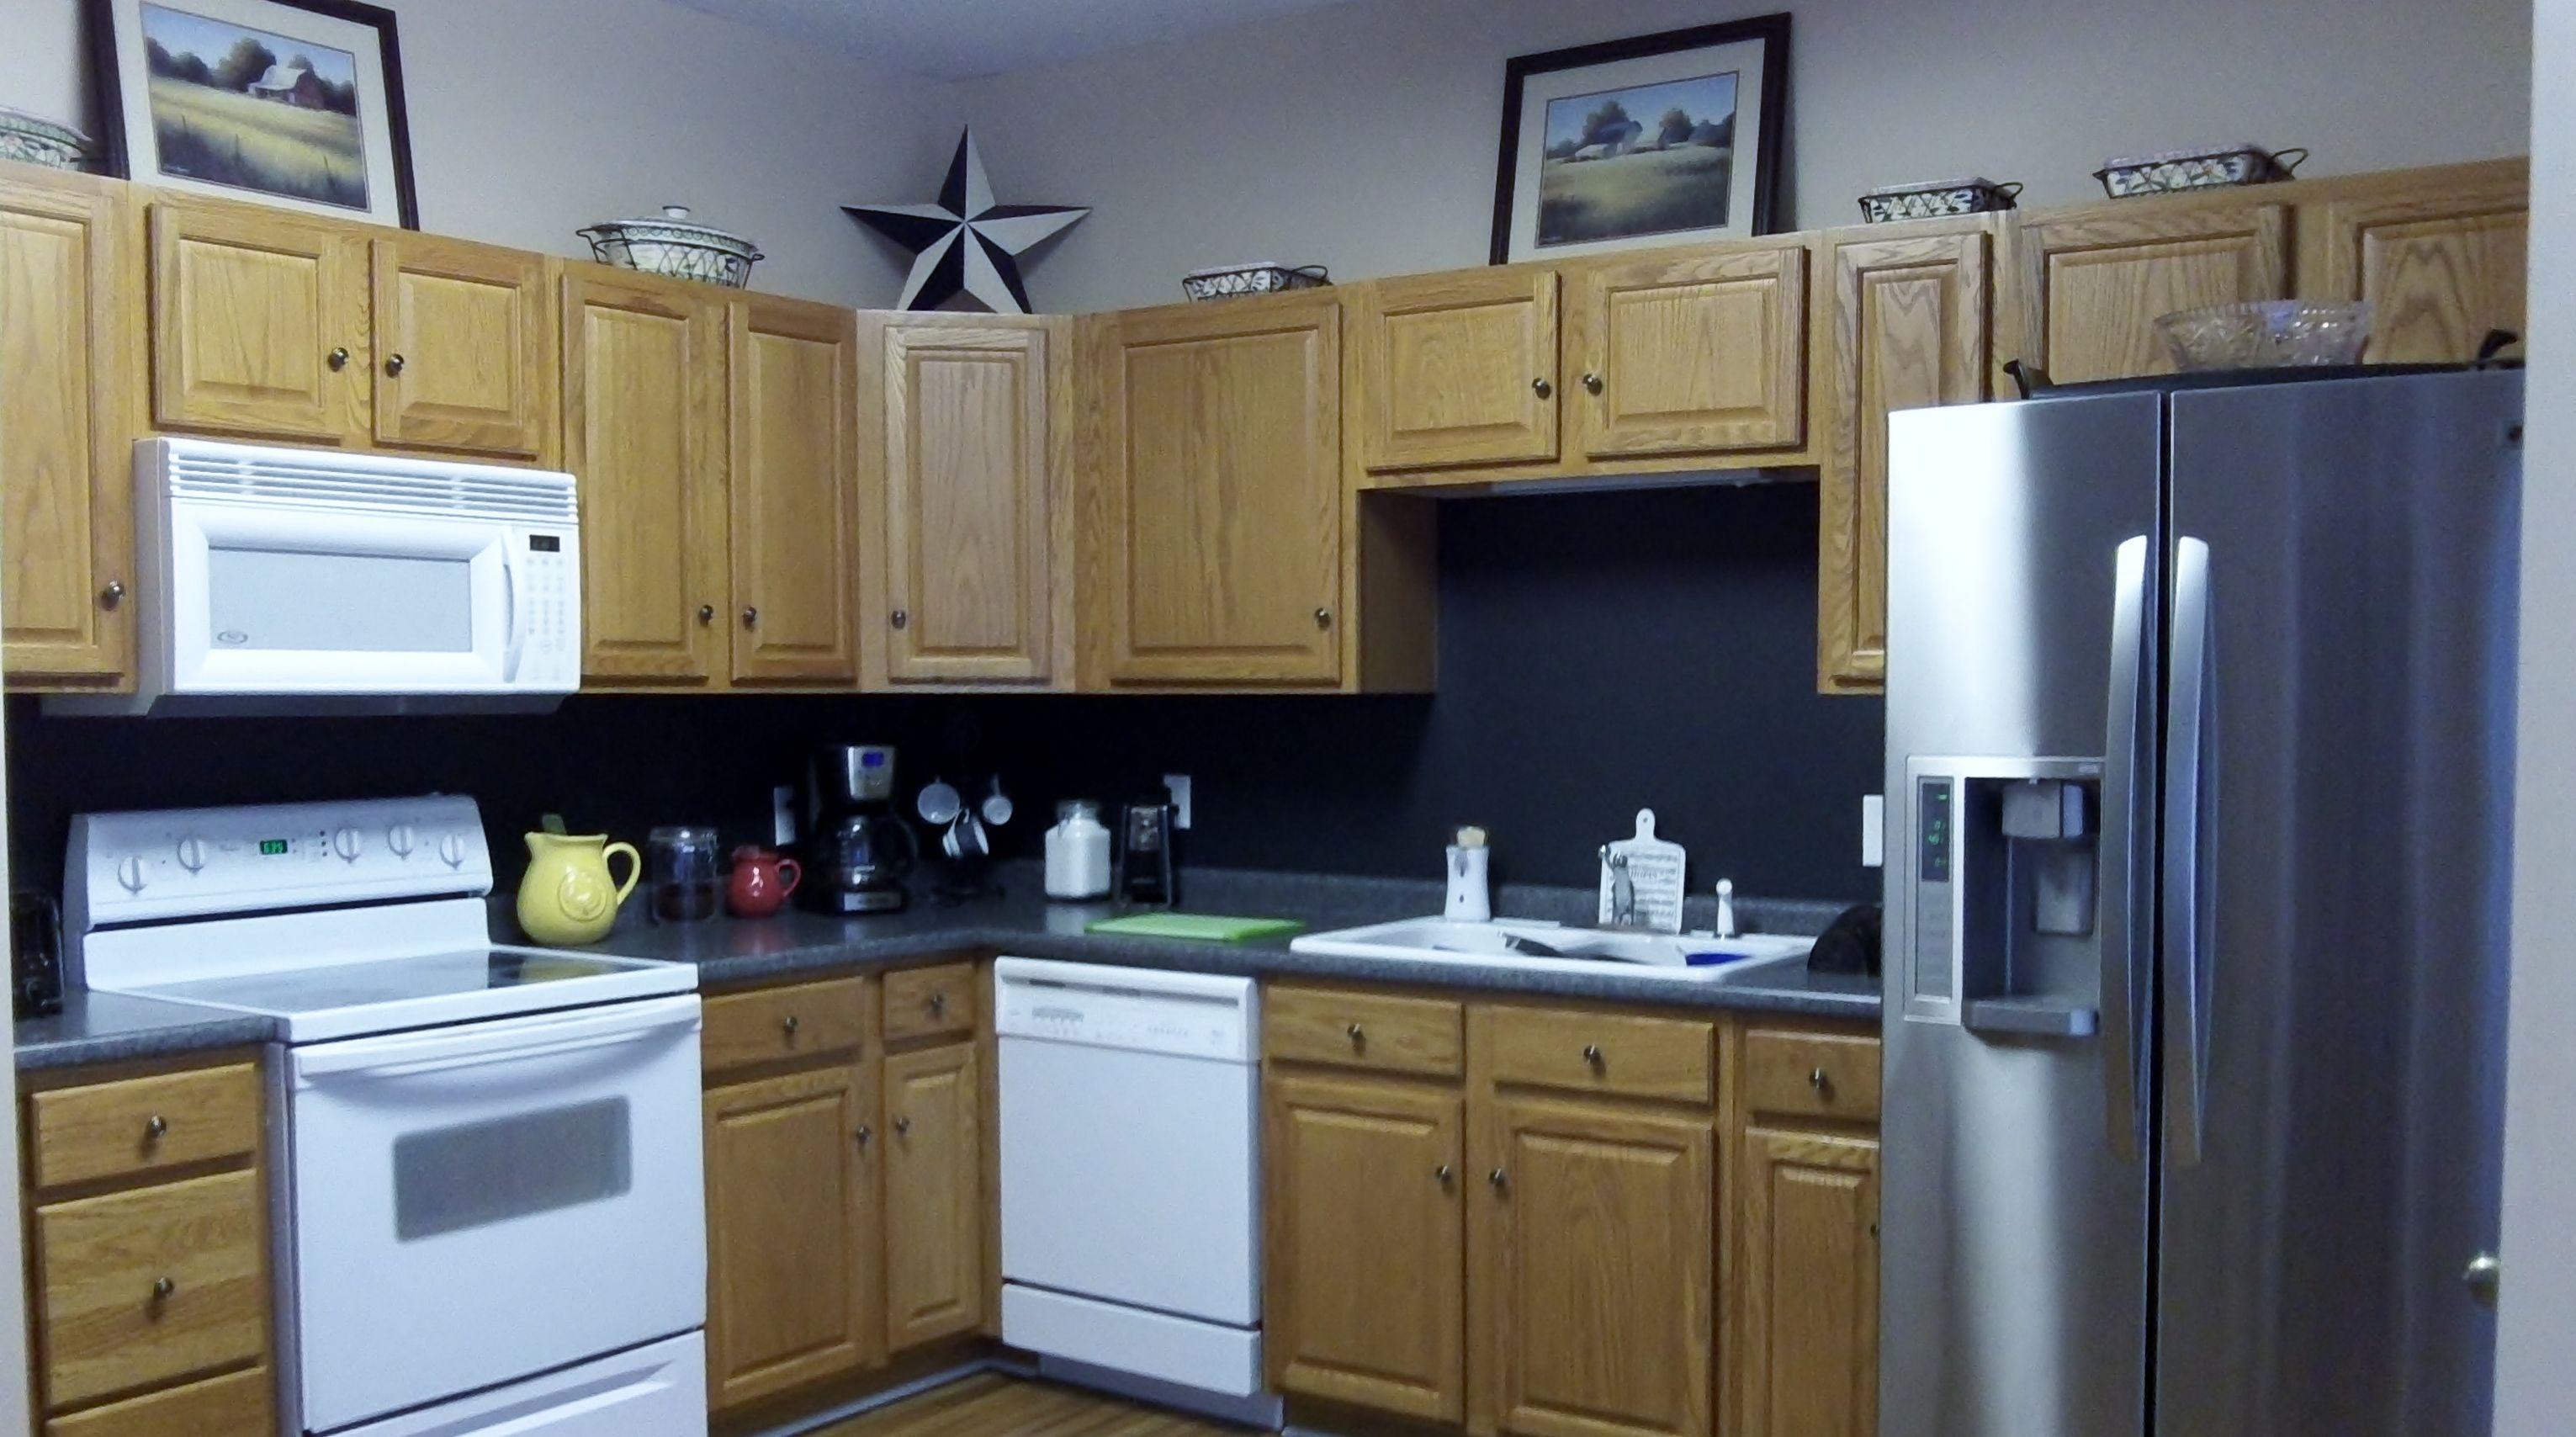 chalkboard backsplash kitchen decor pinterest inexpensive kitchen backsplash ideas budget friendly